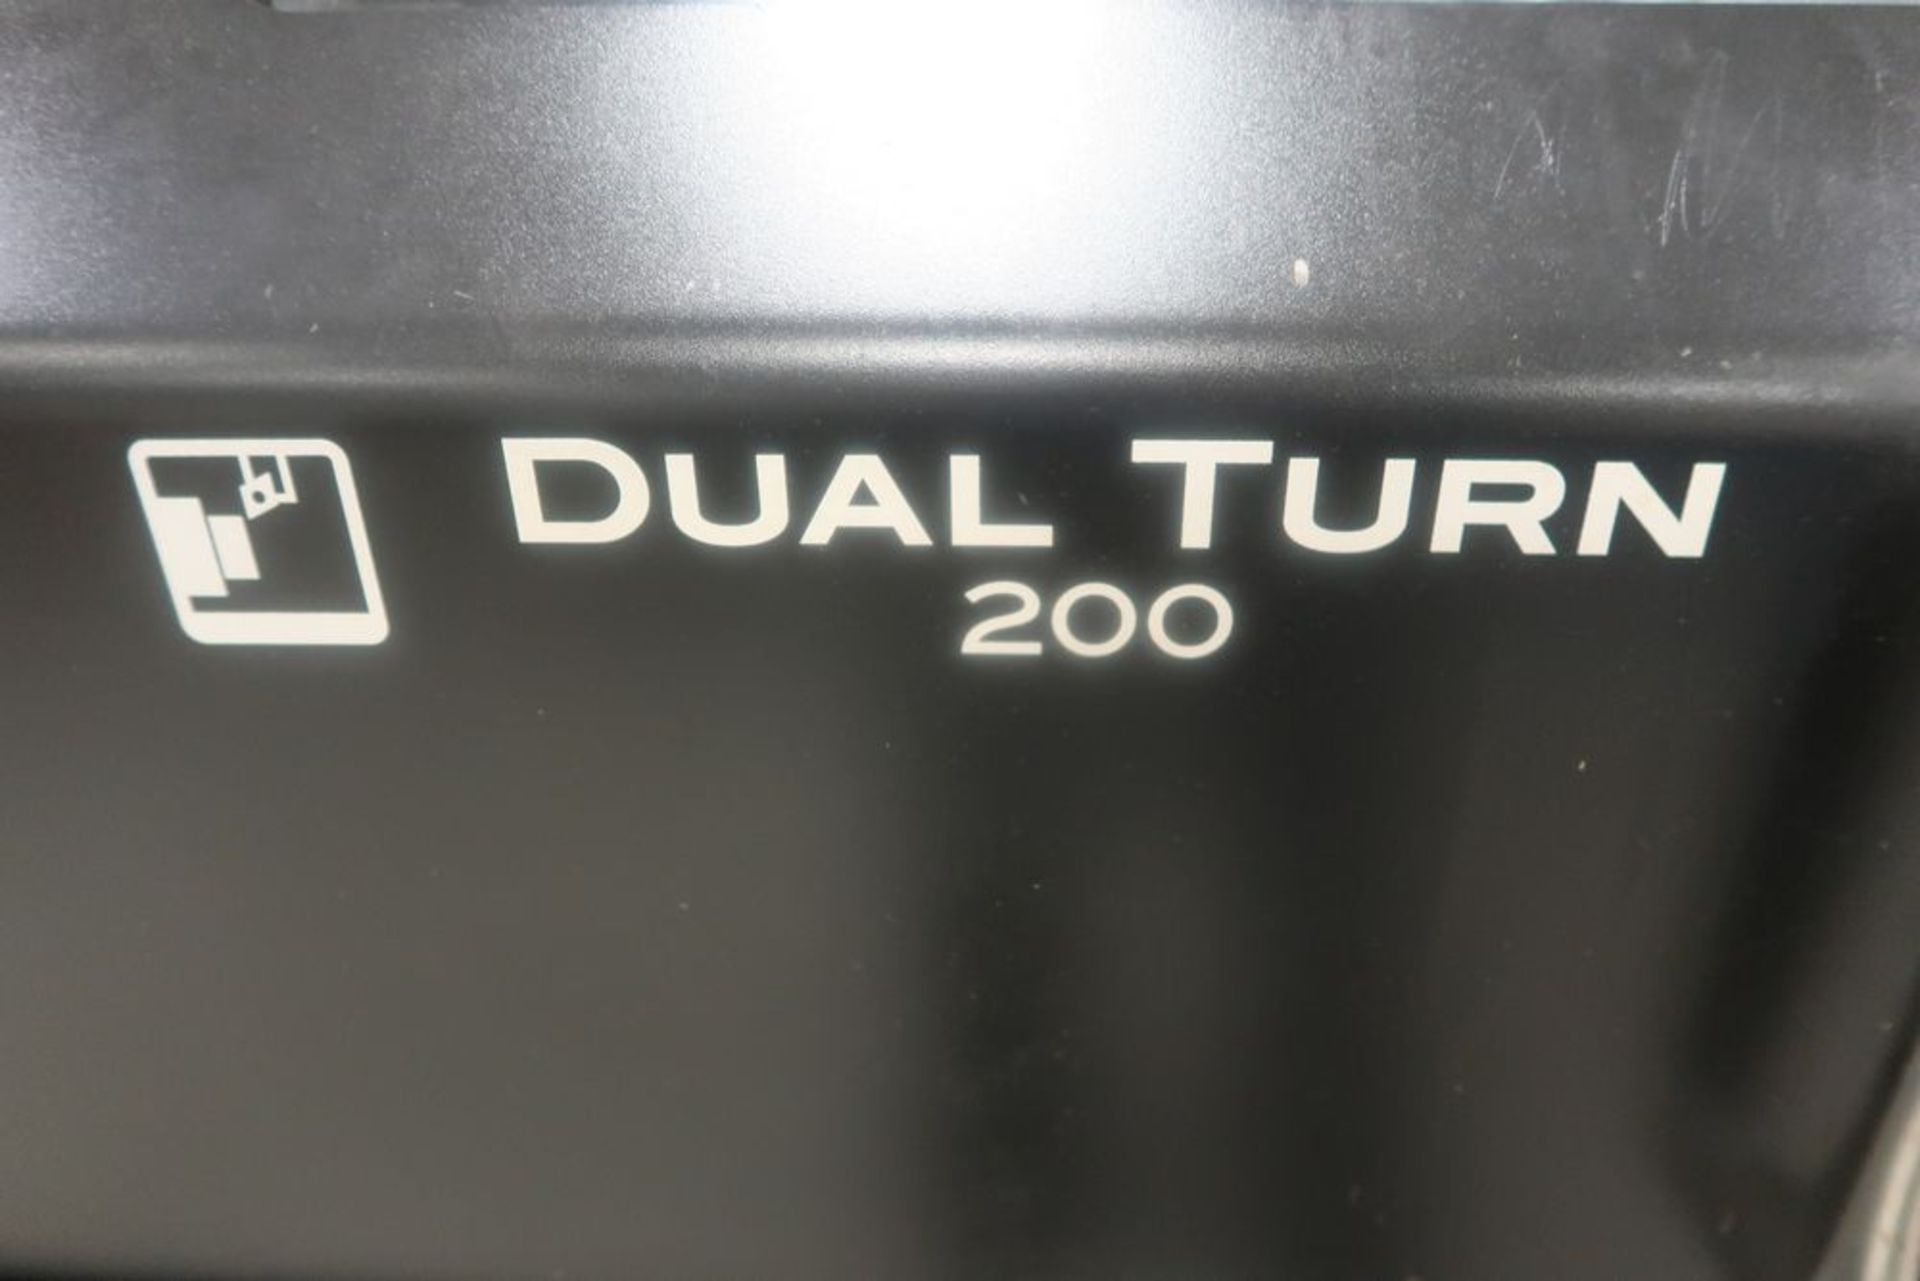 Lot 5 - Mazak Dual turn 200 Twin Spindle CNC Turning Center Lathe, S/N 287830, New 2018